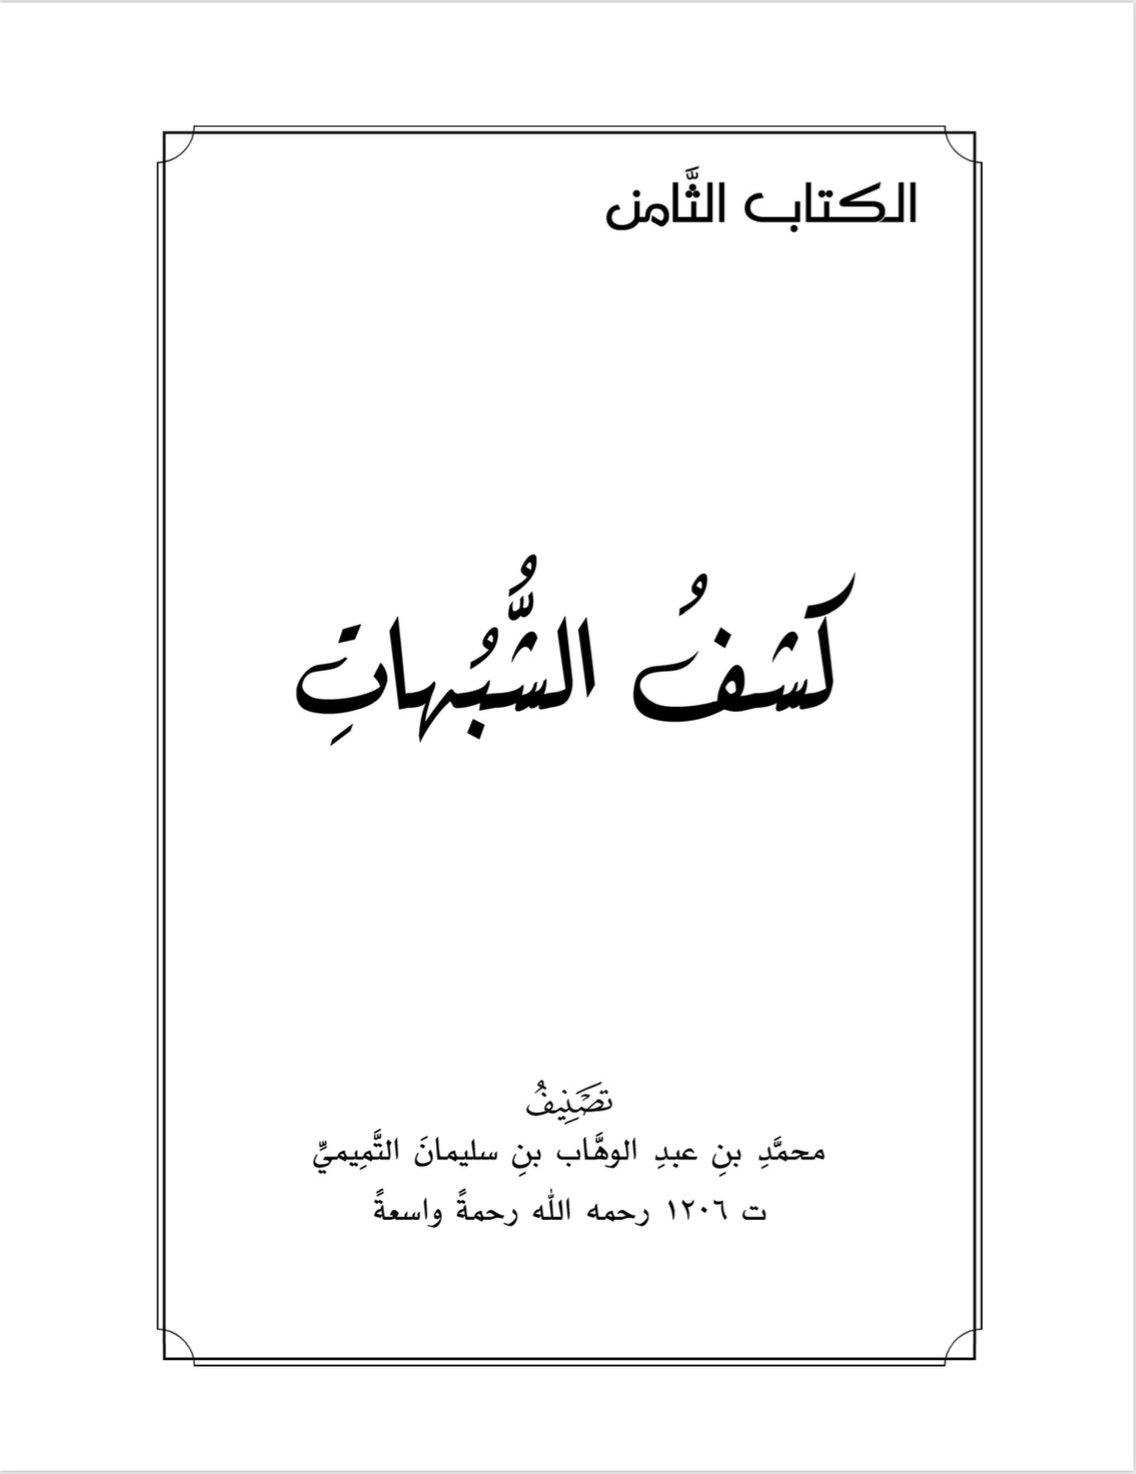 Kashf Ash-Shubuhaat (Removal of Doubts) - Nader Ibn Muhammad - imagen de portada